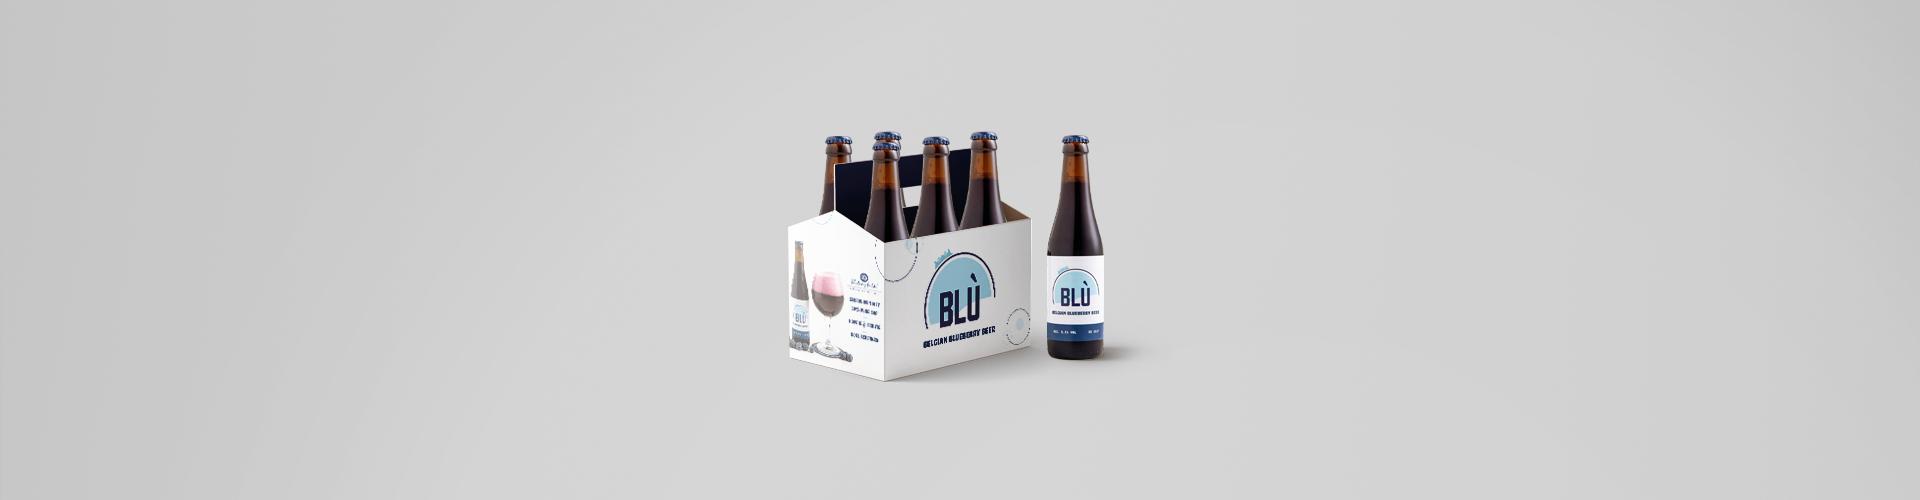 Blù Bier box 6